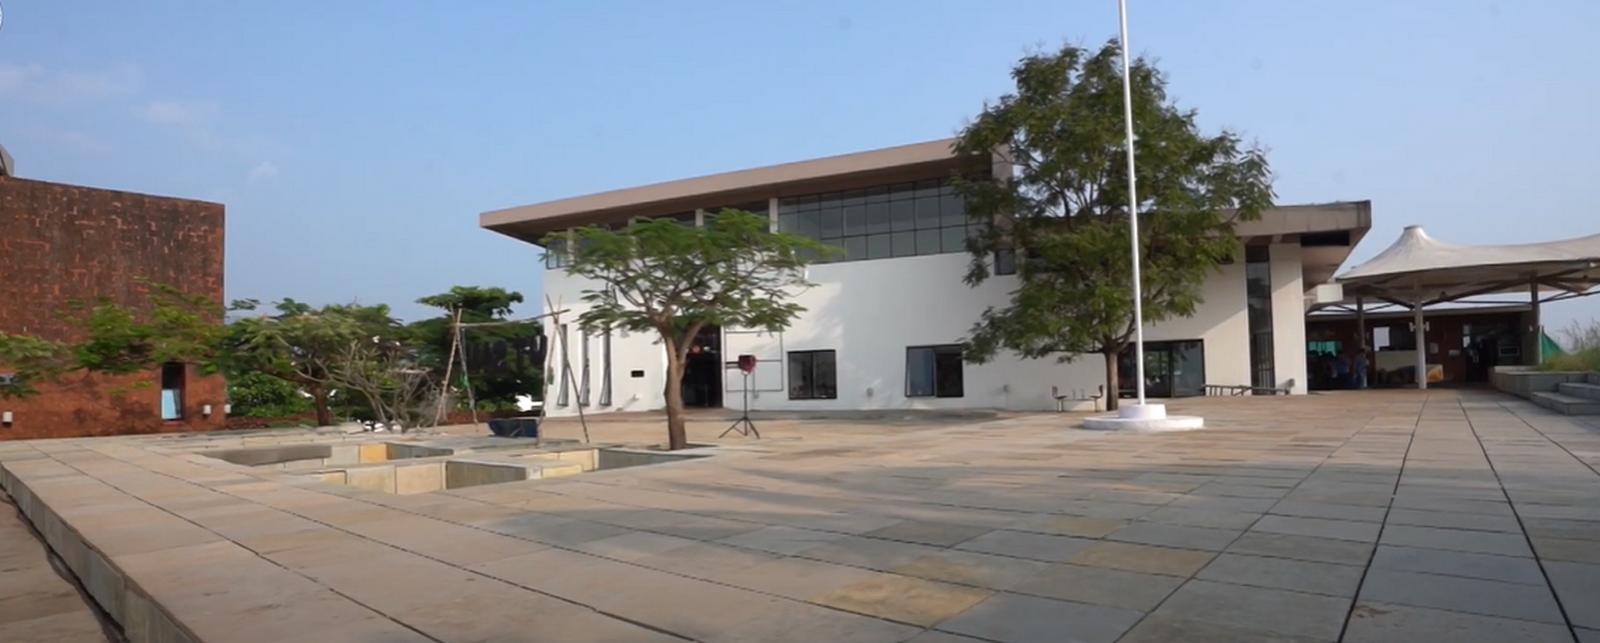 Goa institute of management by Brinda Somaya: Bridge between traditional and conventional design - Sheet7